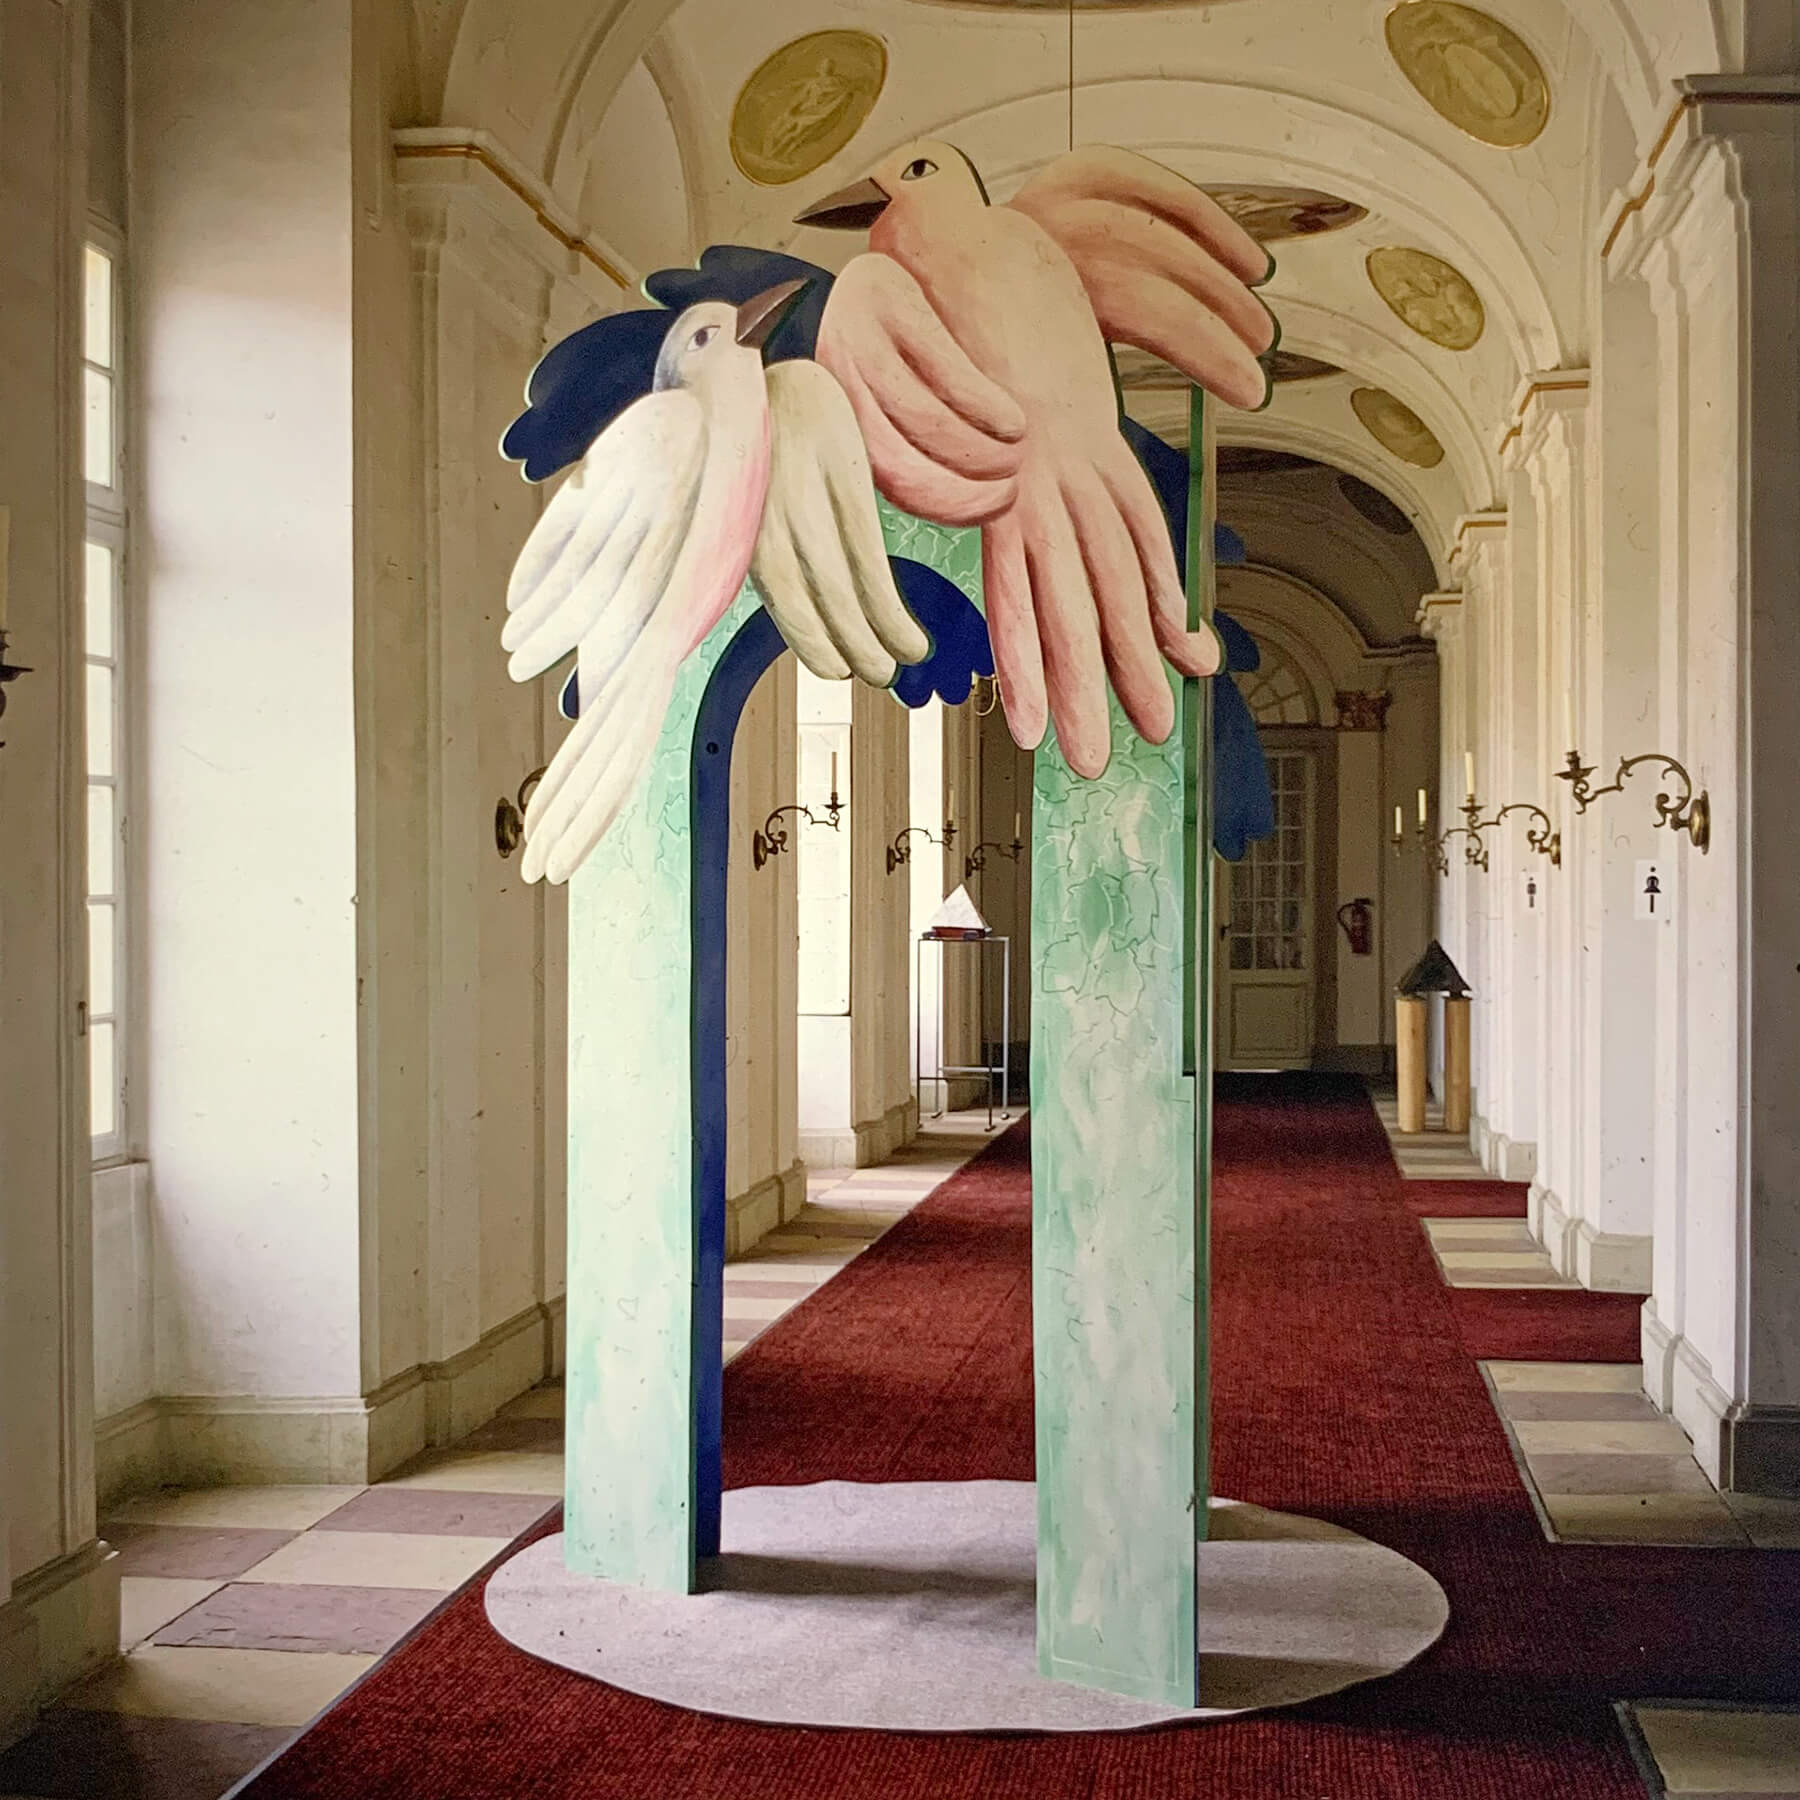 Barbara Jäger Malerei Skulptur Karlsruhe Vogeltor Schloß Ludwigsburg